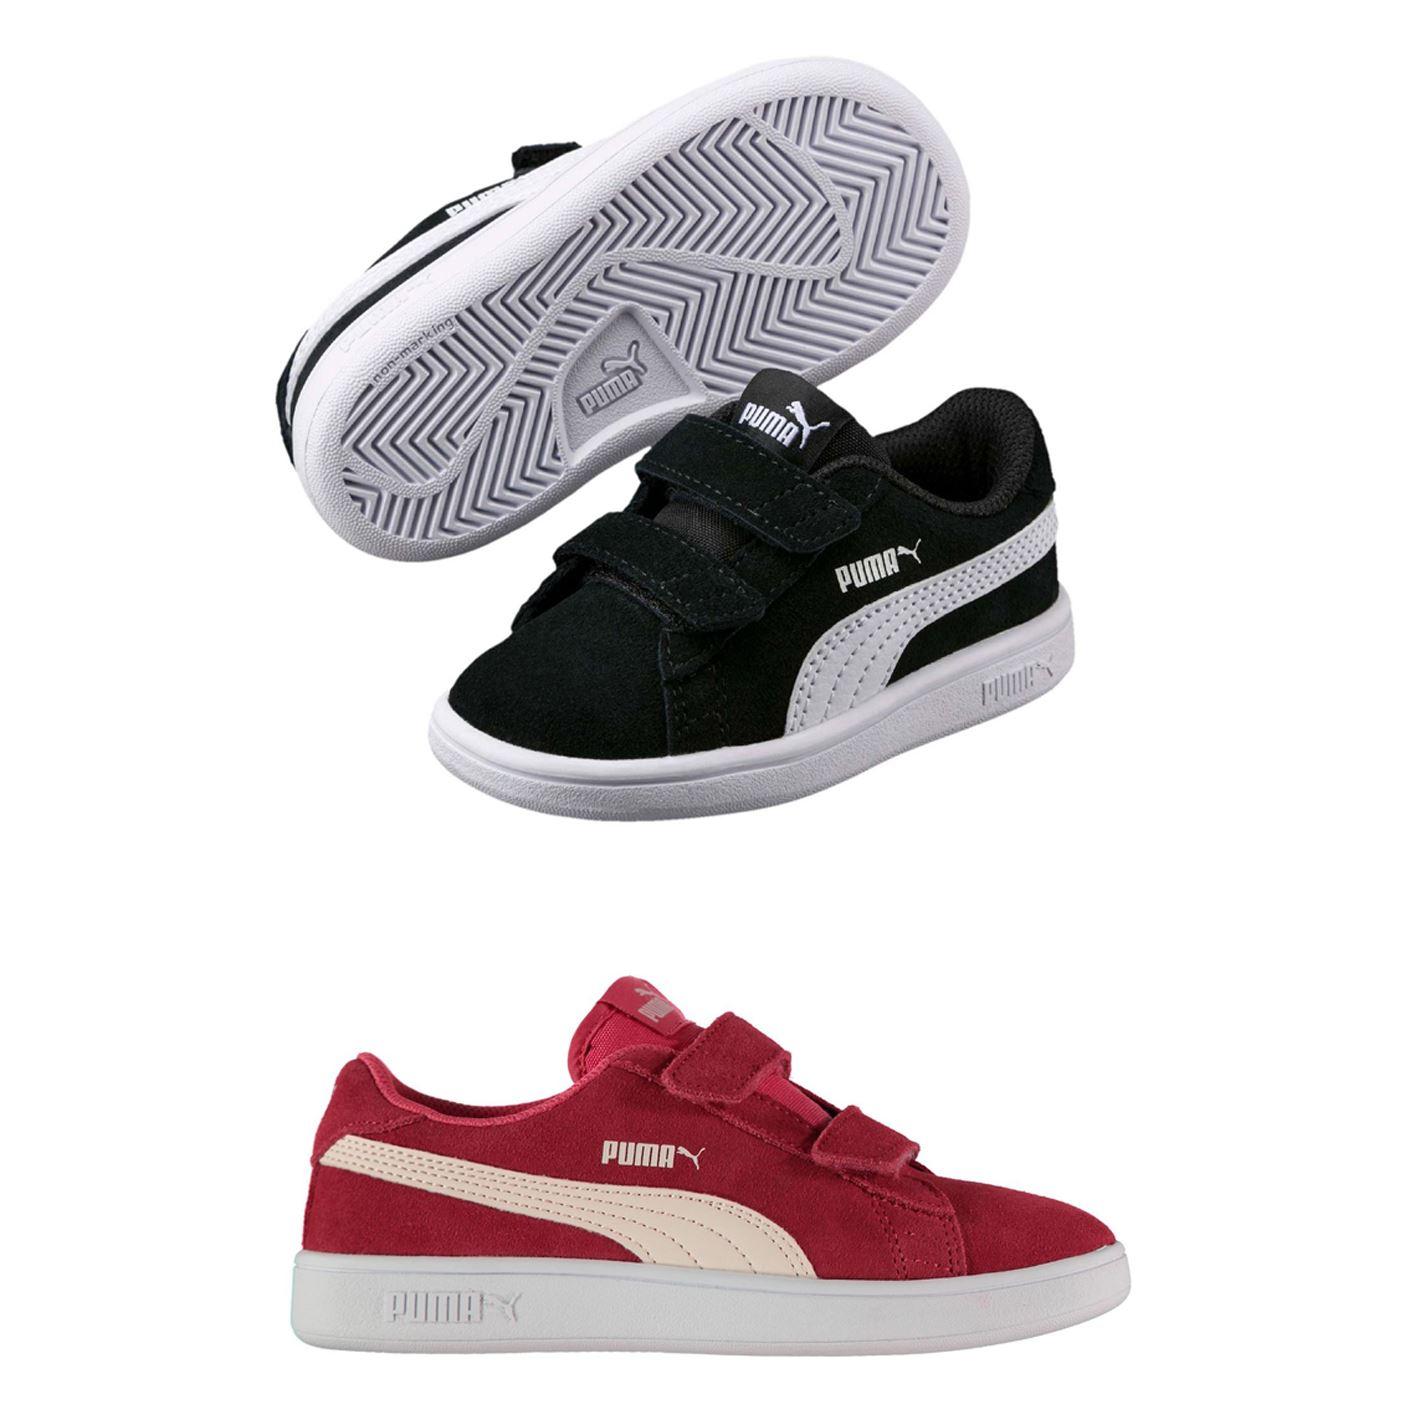 official photos 5bfc9 bd548 Details about Puma Smash Suede Infant Girls Trainers Shoes Footwear